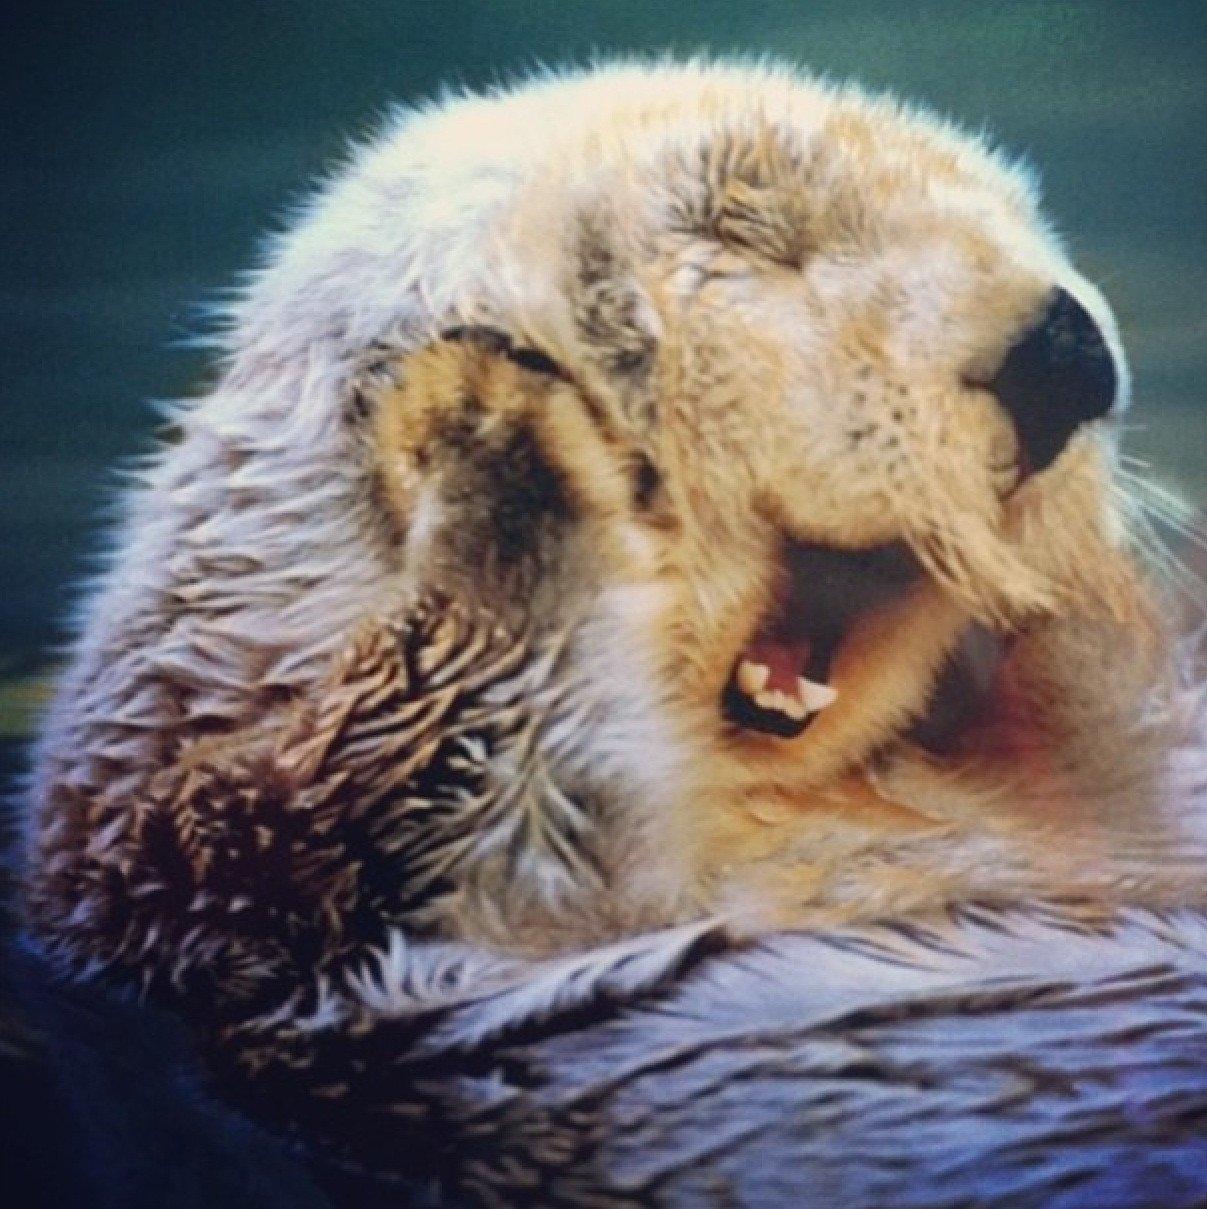 Baby Otter Wallpaper - WallpaperSafari